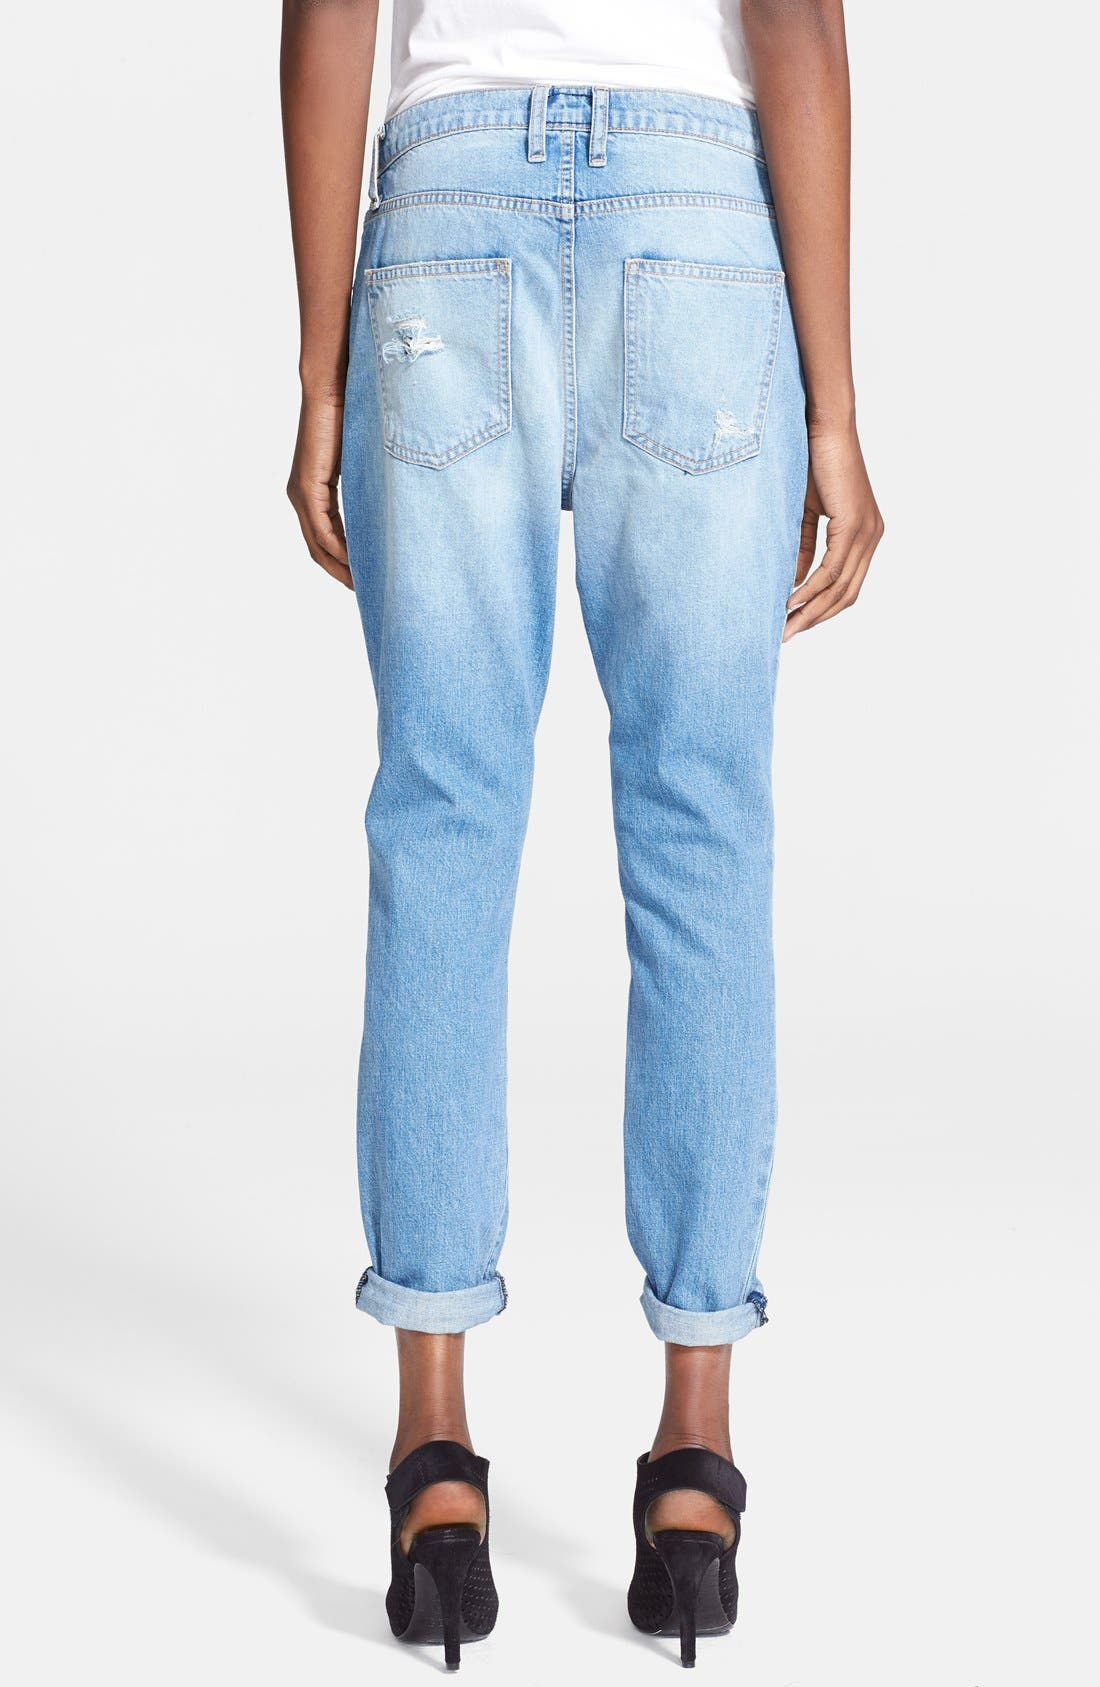 Alternate Image 2  - Current/Elliott 'The Fling' Destroyed Crop Jeans (Kasey with Repair)